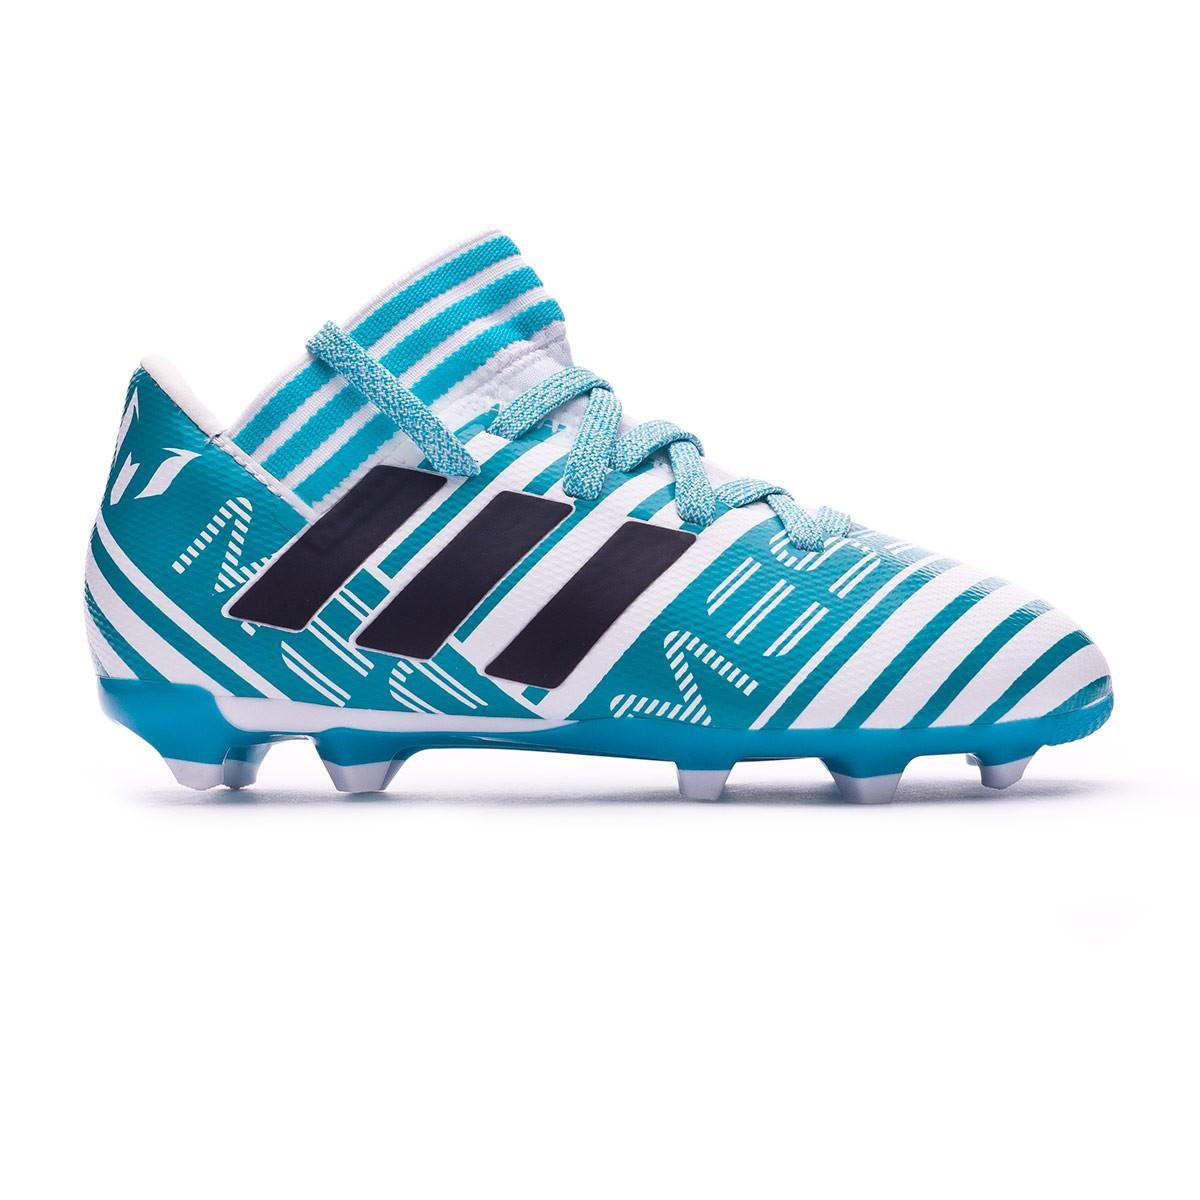 a12b8449567f1 Zapatos de fútbol adidas Nemeziz Messi 17.3 FG Niño White-Legend ink-Energy  blue - Tienda de fútbol Fútbol Emotion